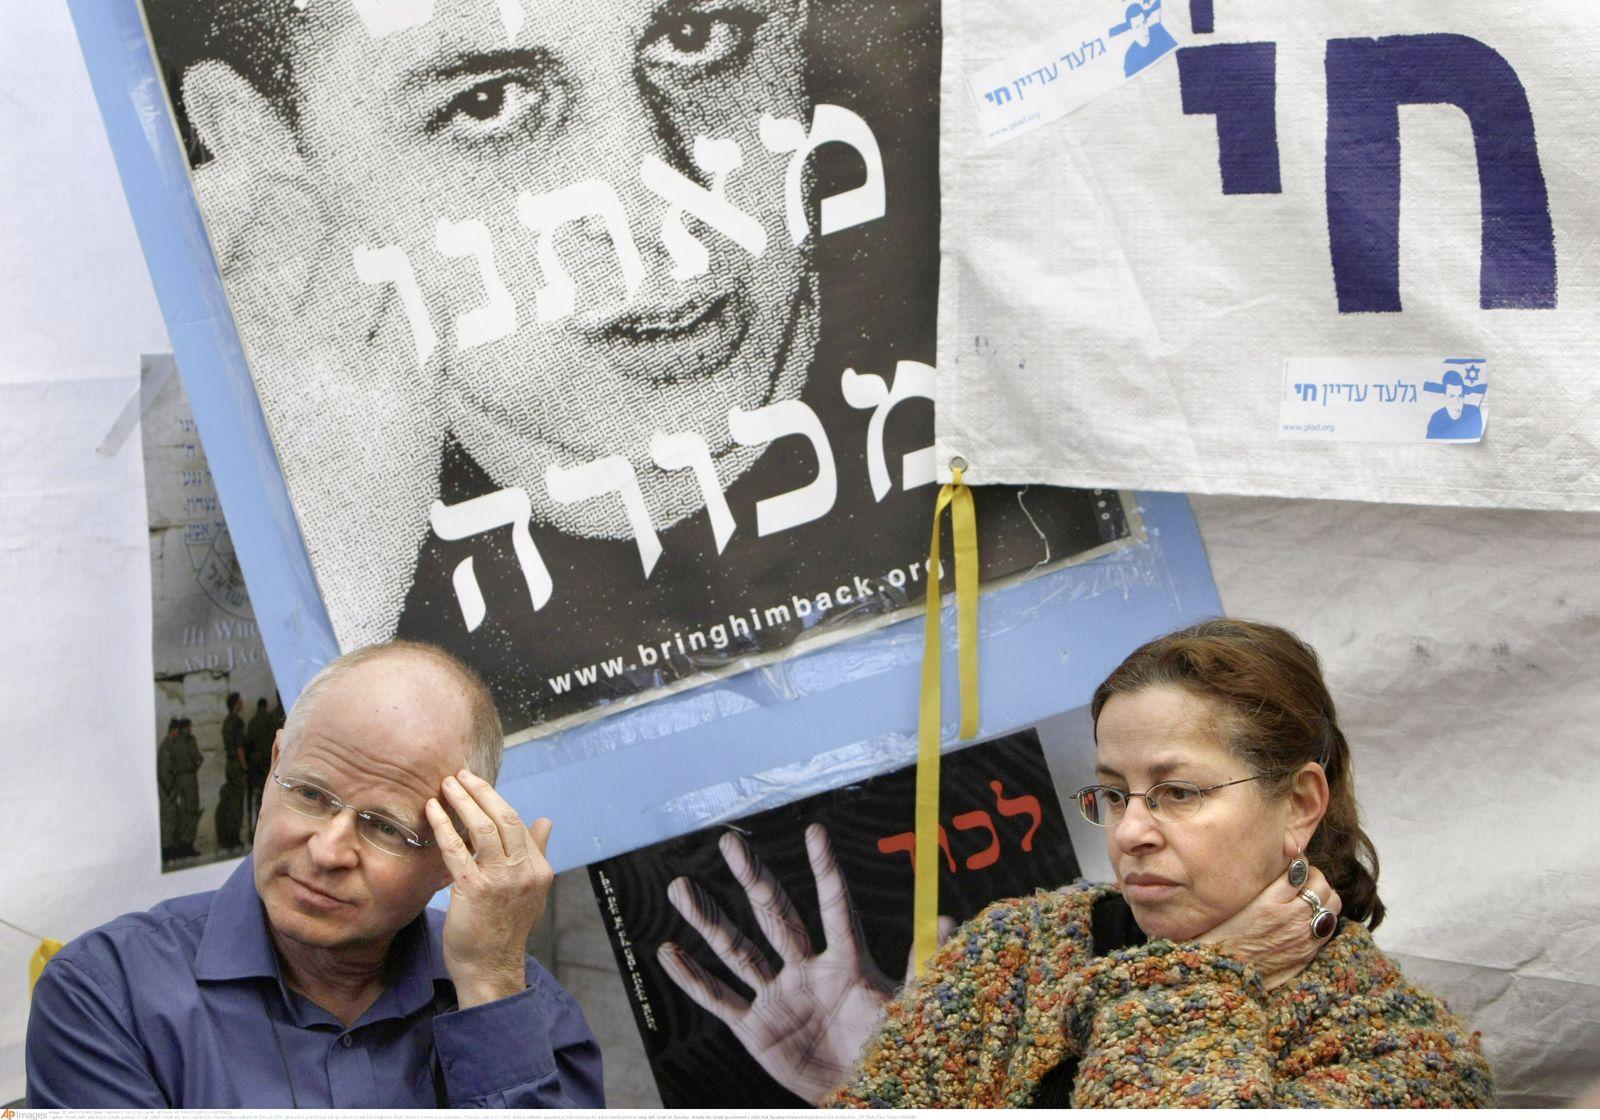 Gilad Schalit / Eltern